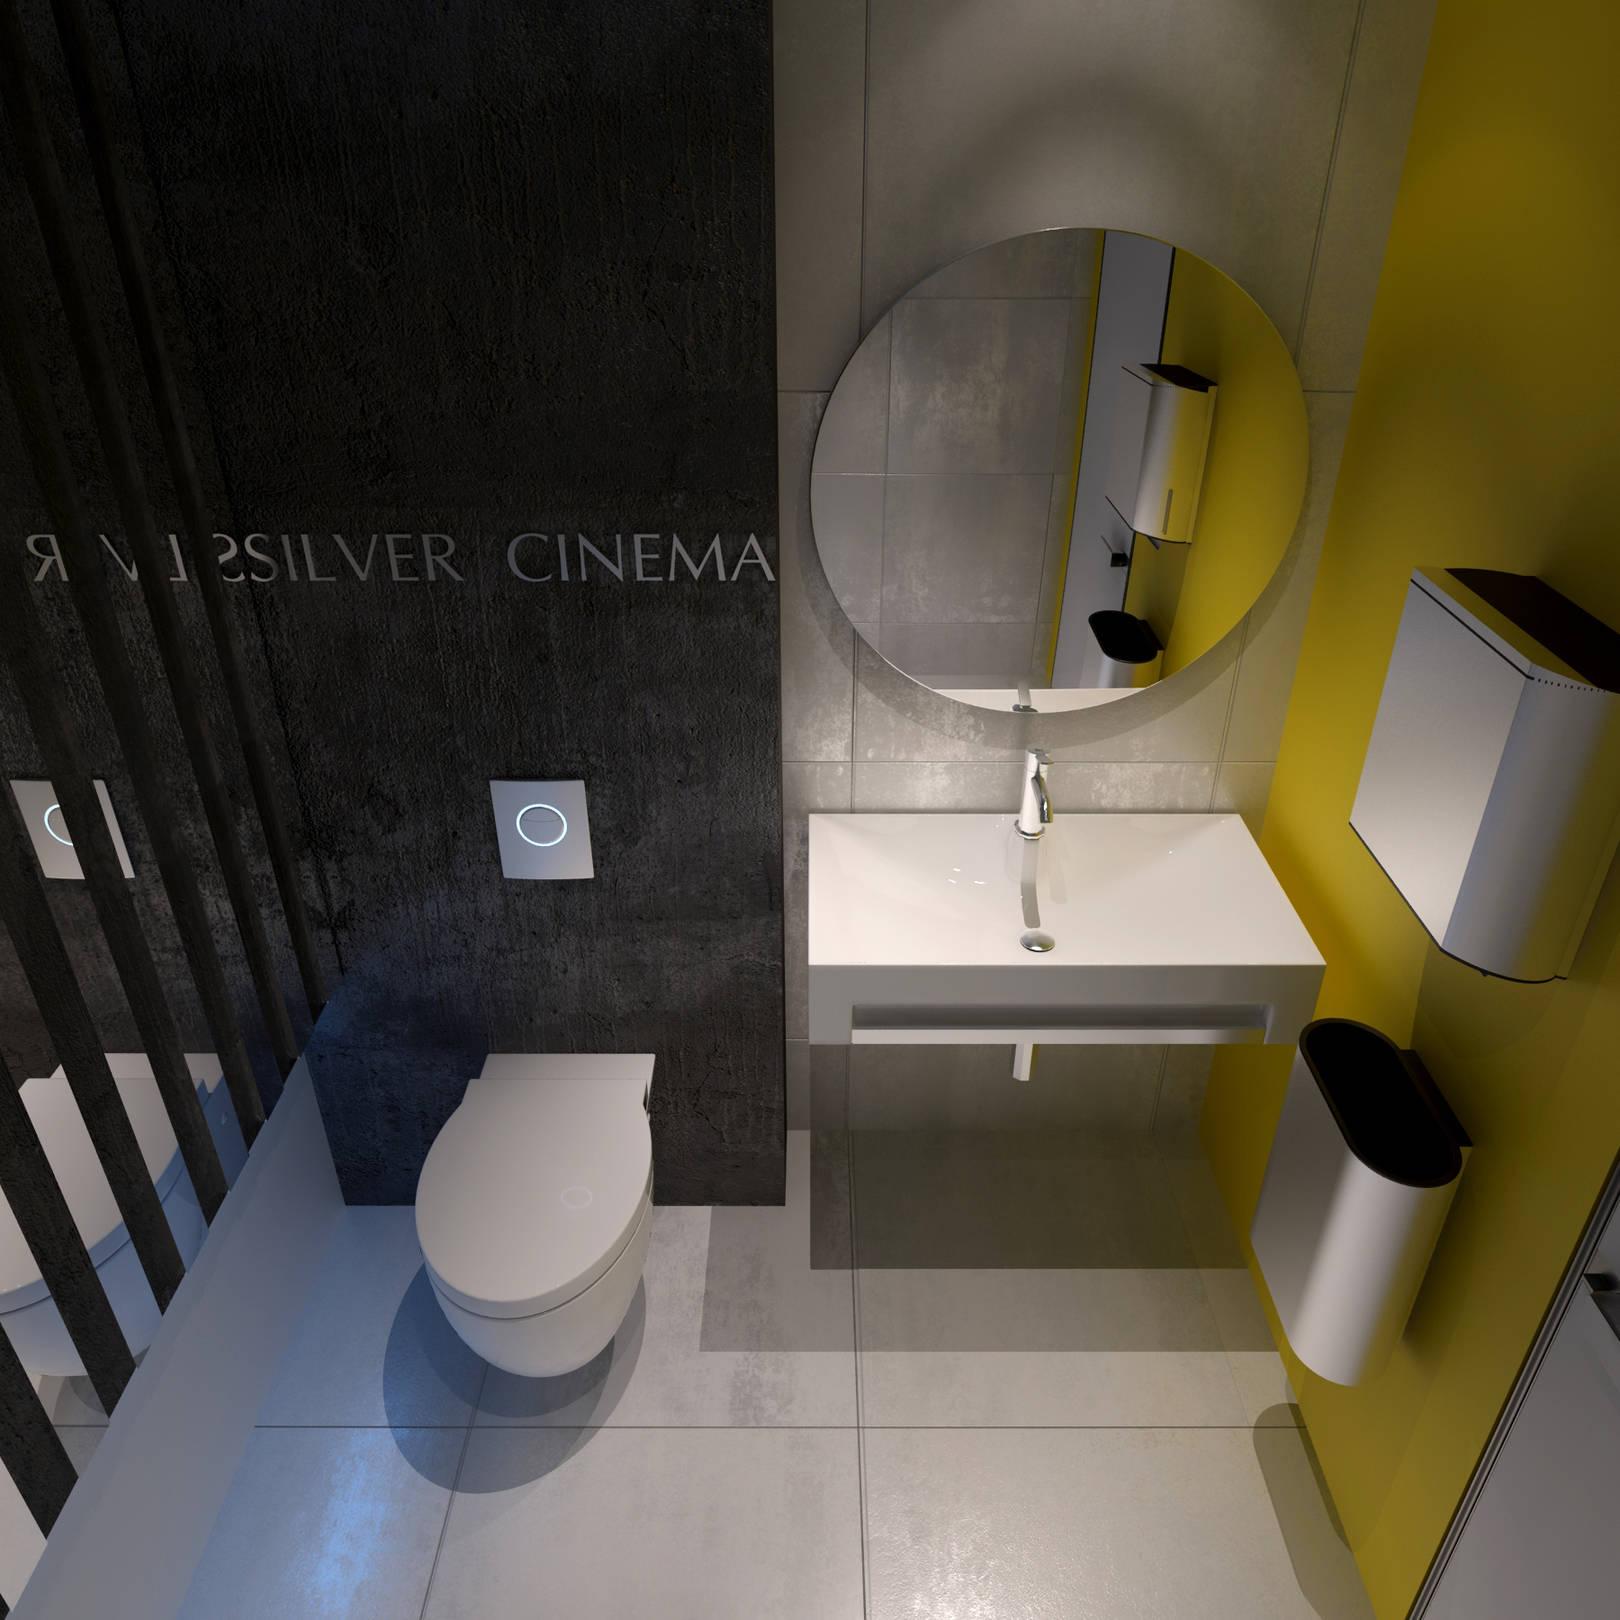 кинотеатр SILVER-Cinema